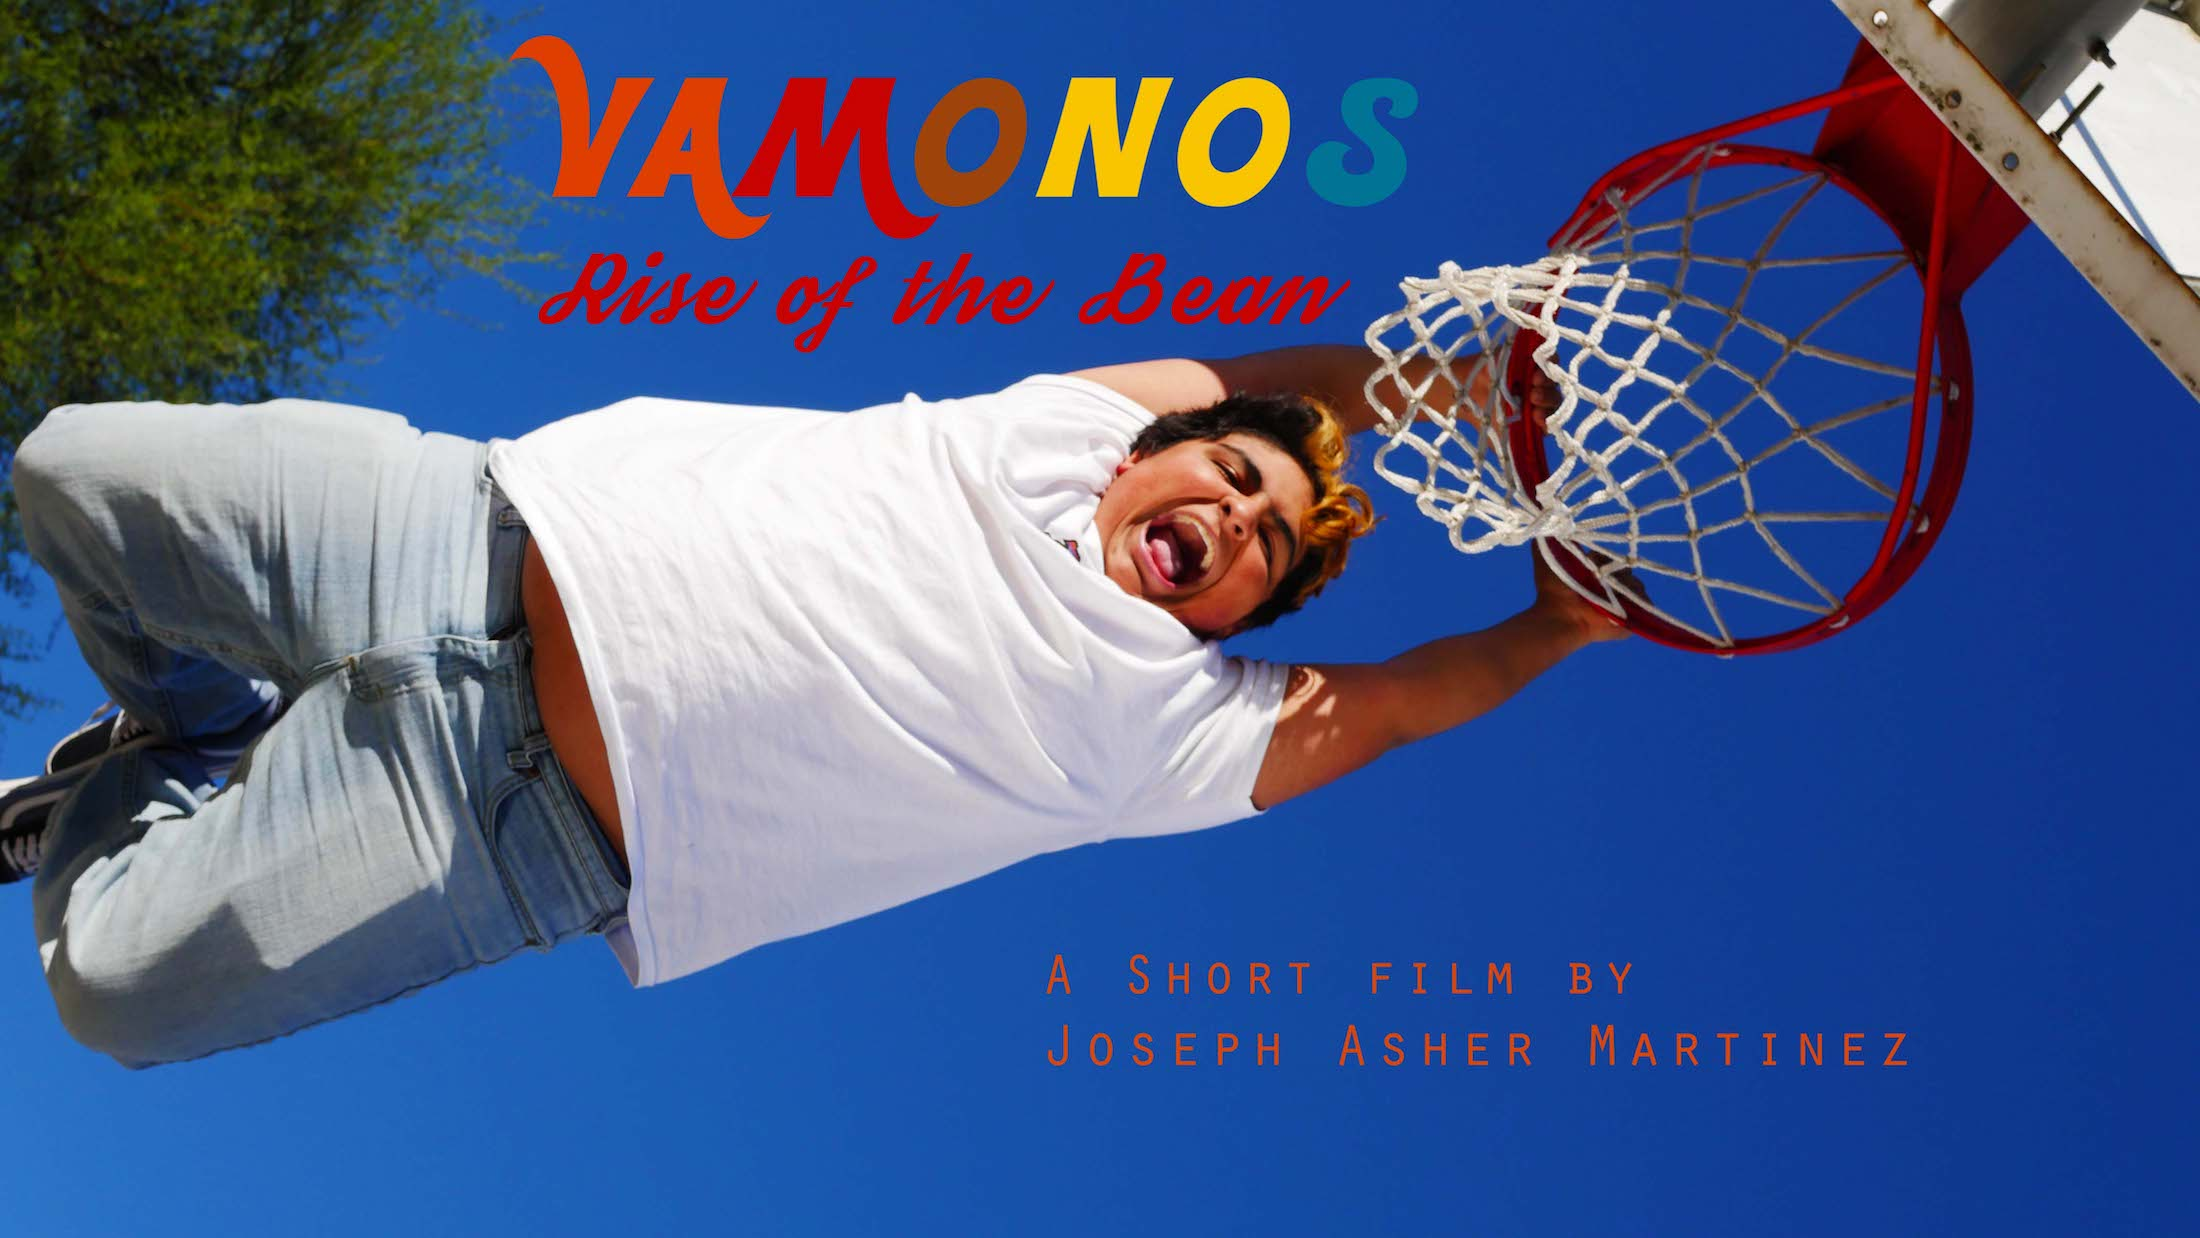 Can Osmar Bean Bring his Game during VAMONOS Rise of the Bean?